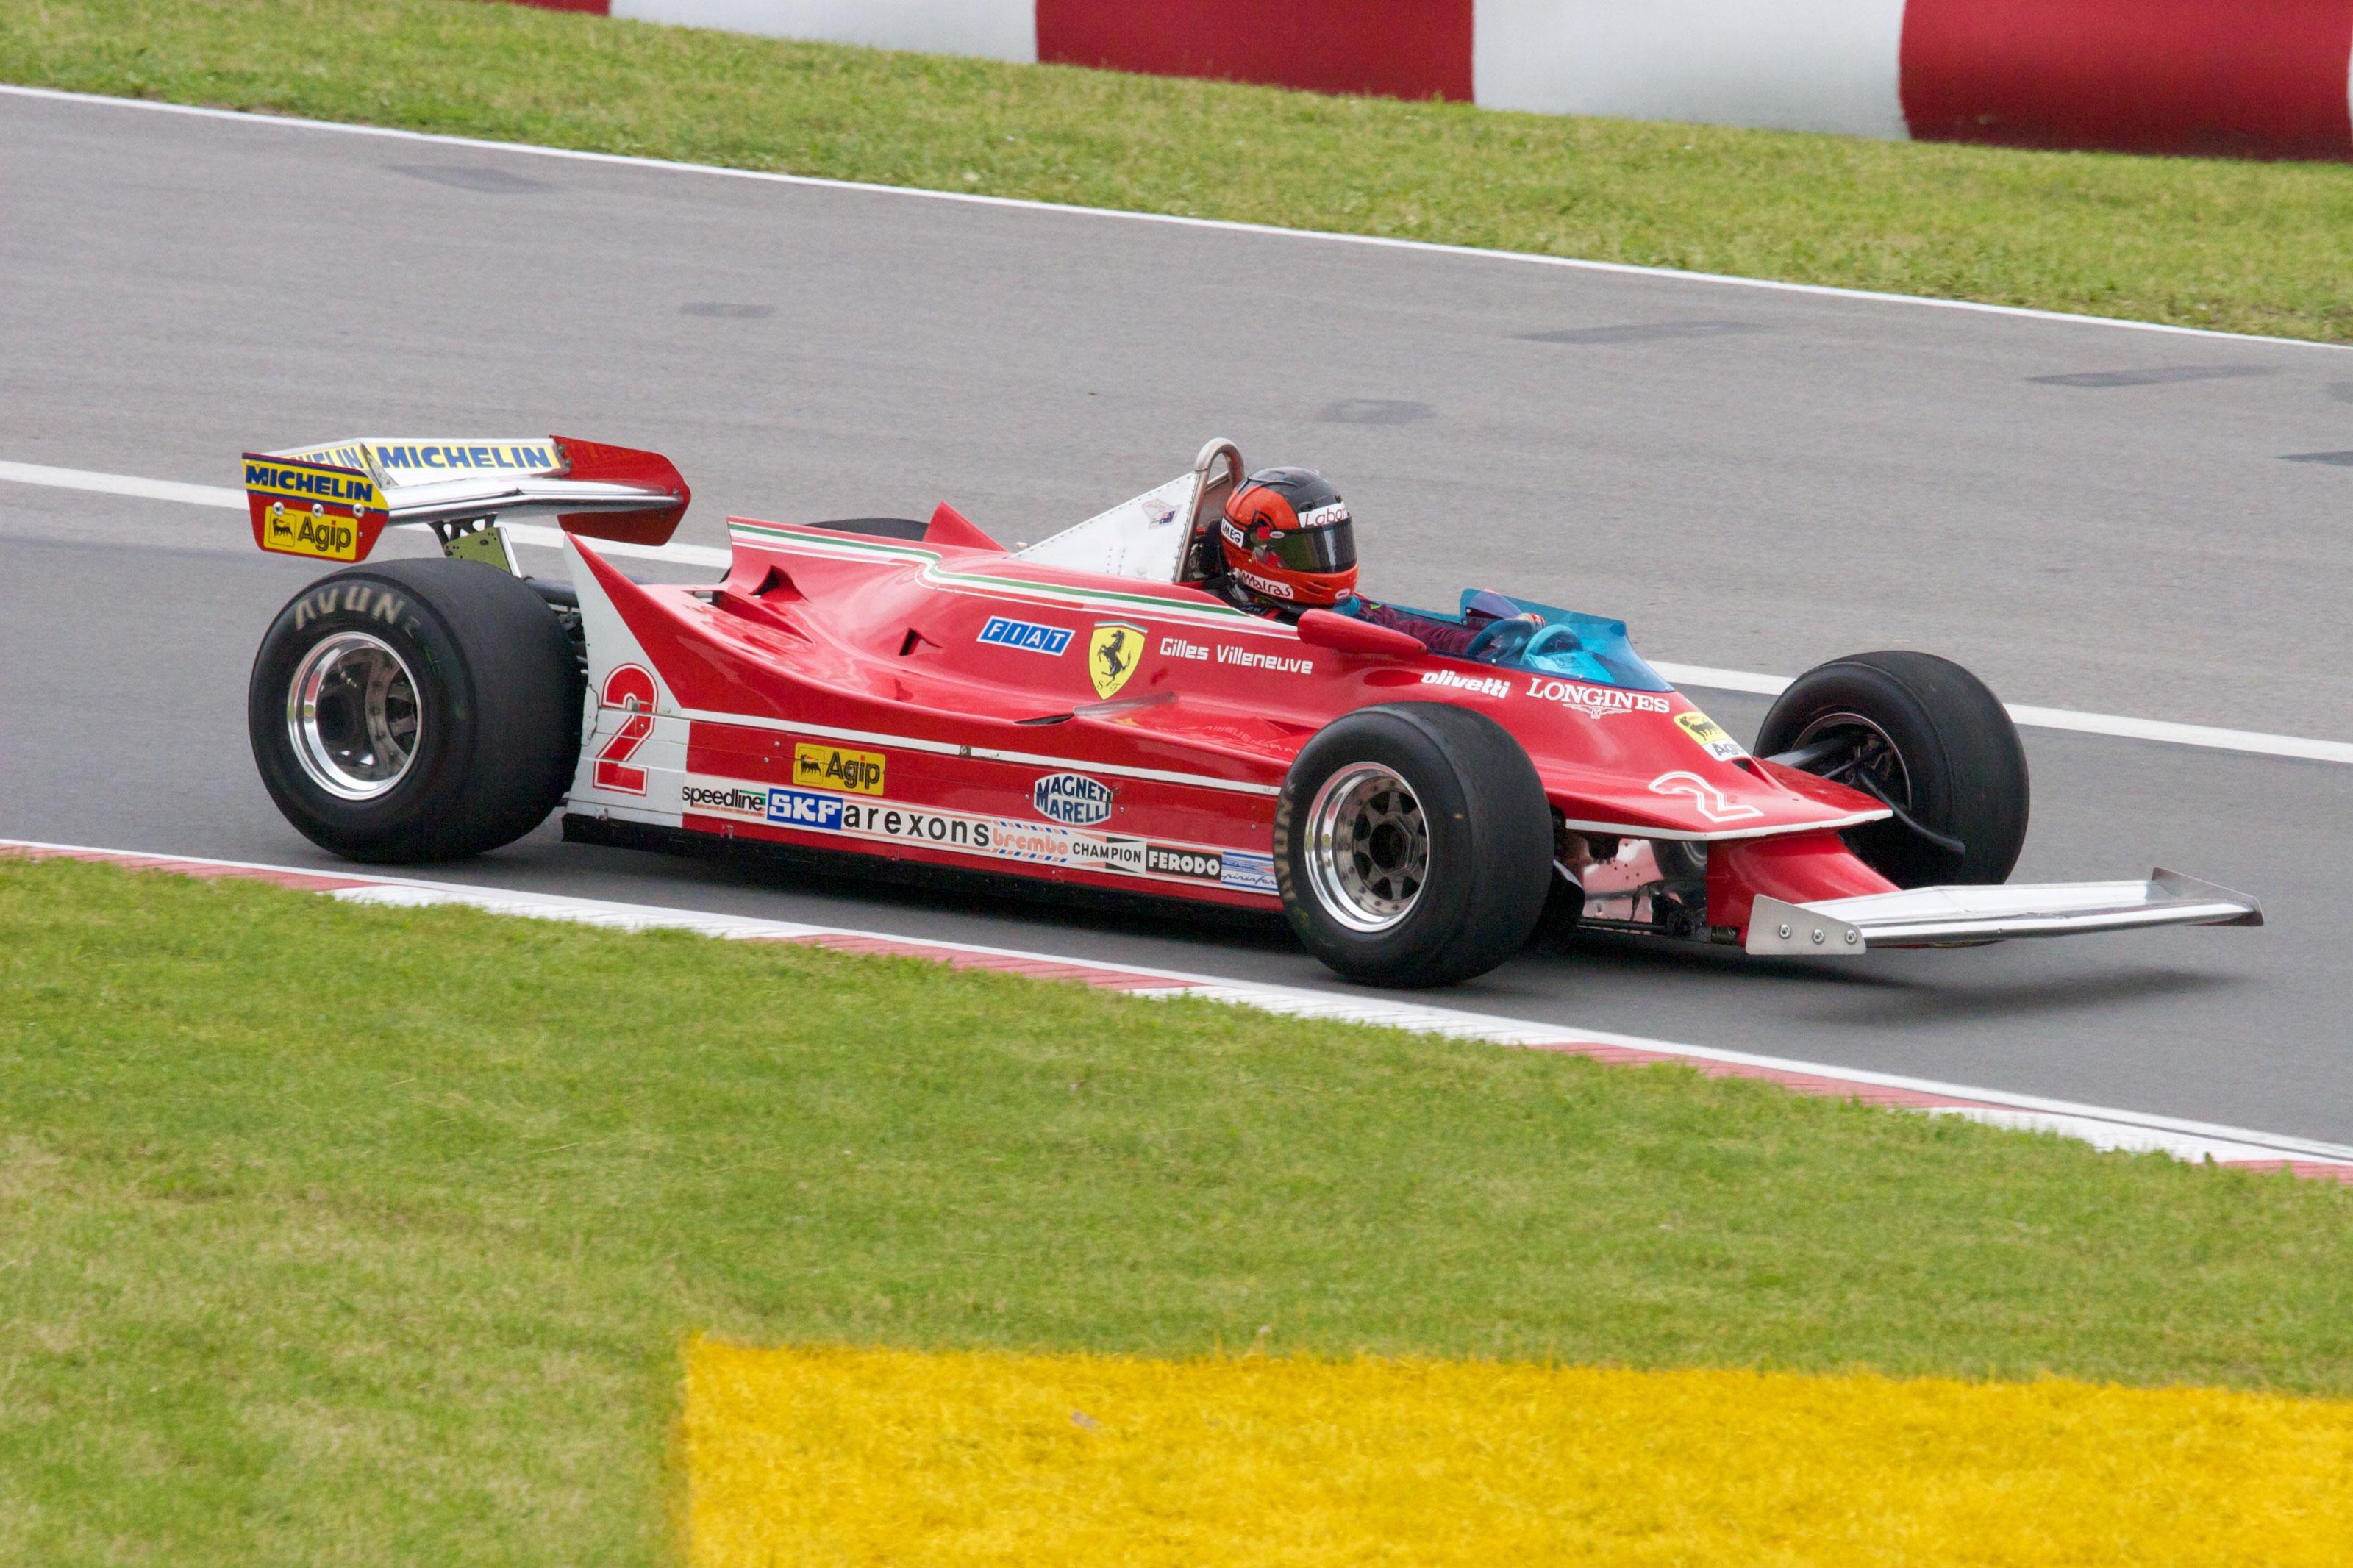 Gilles Villeneuve's Ferrari 312T5 at the Histric race during the 2010 Canadian GP